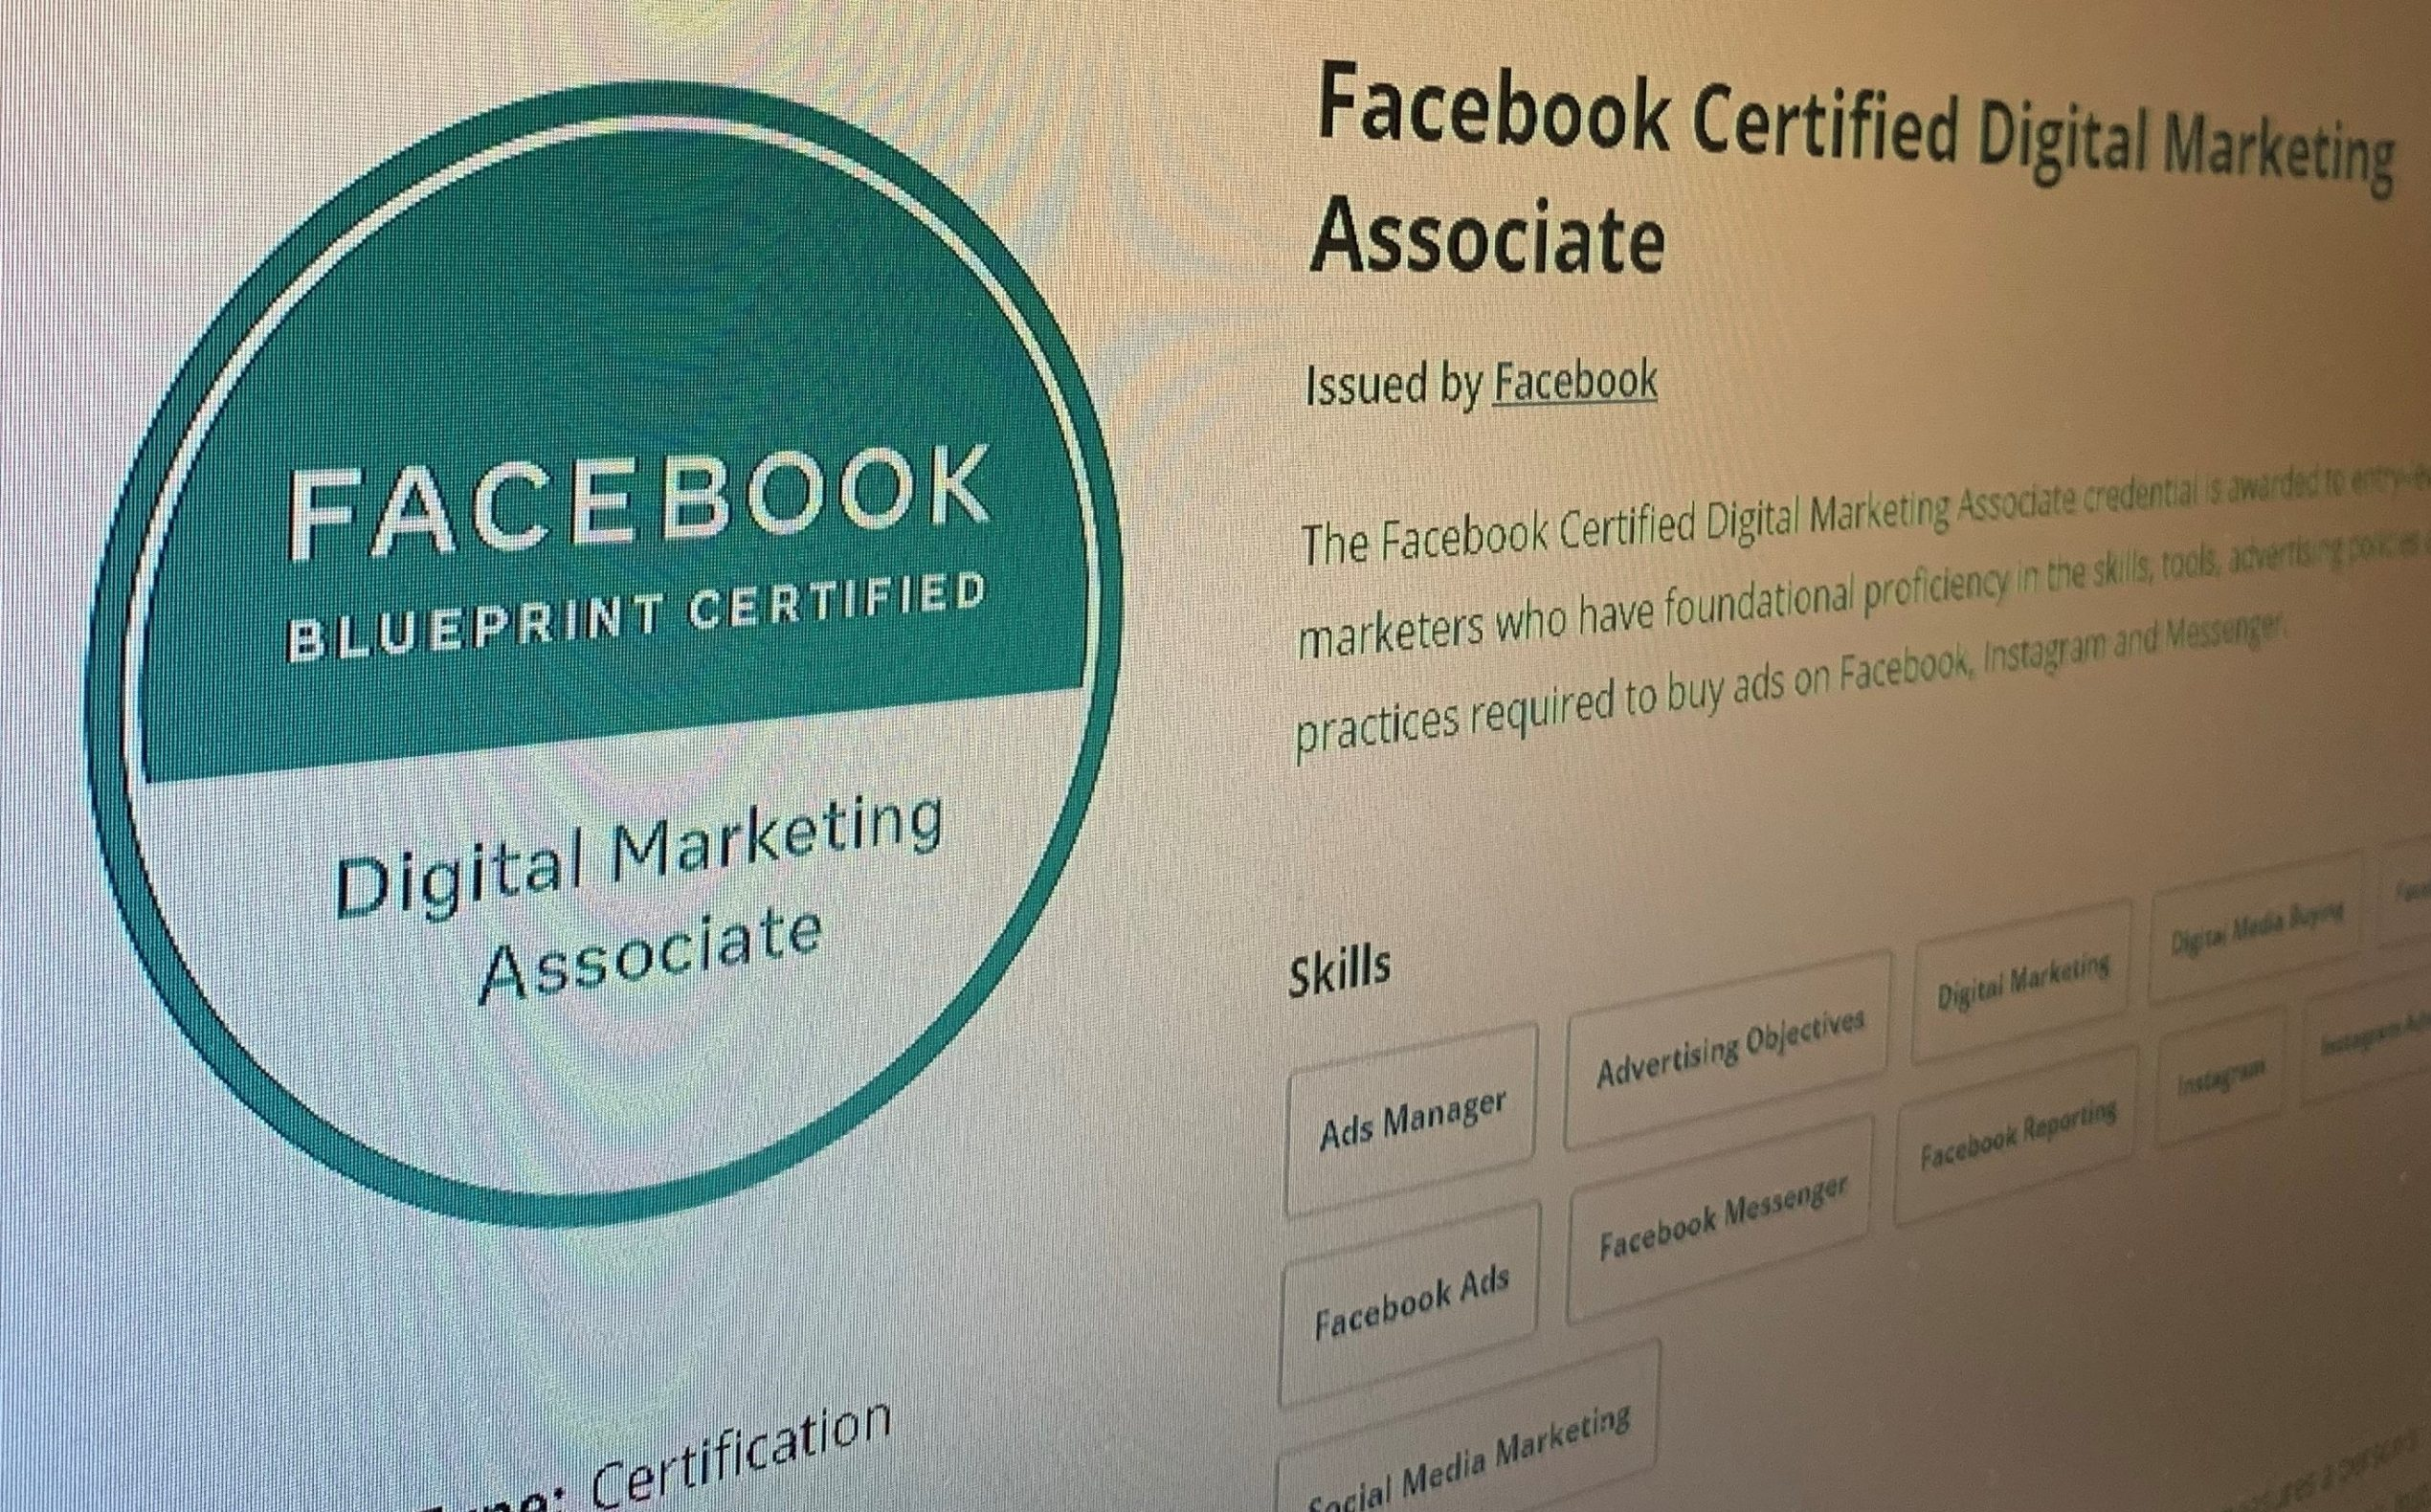 Facebook Giving 100,000 Scholarships to Black Learners Seeking Digital Marketing Certifications